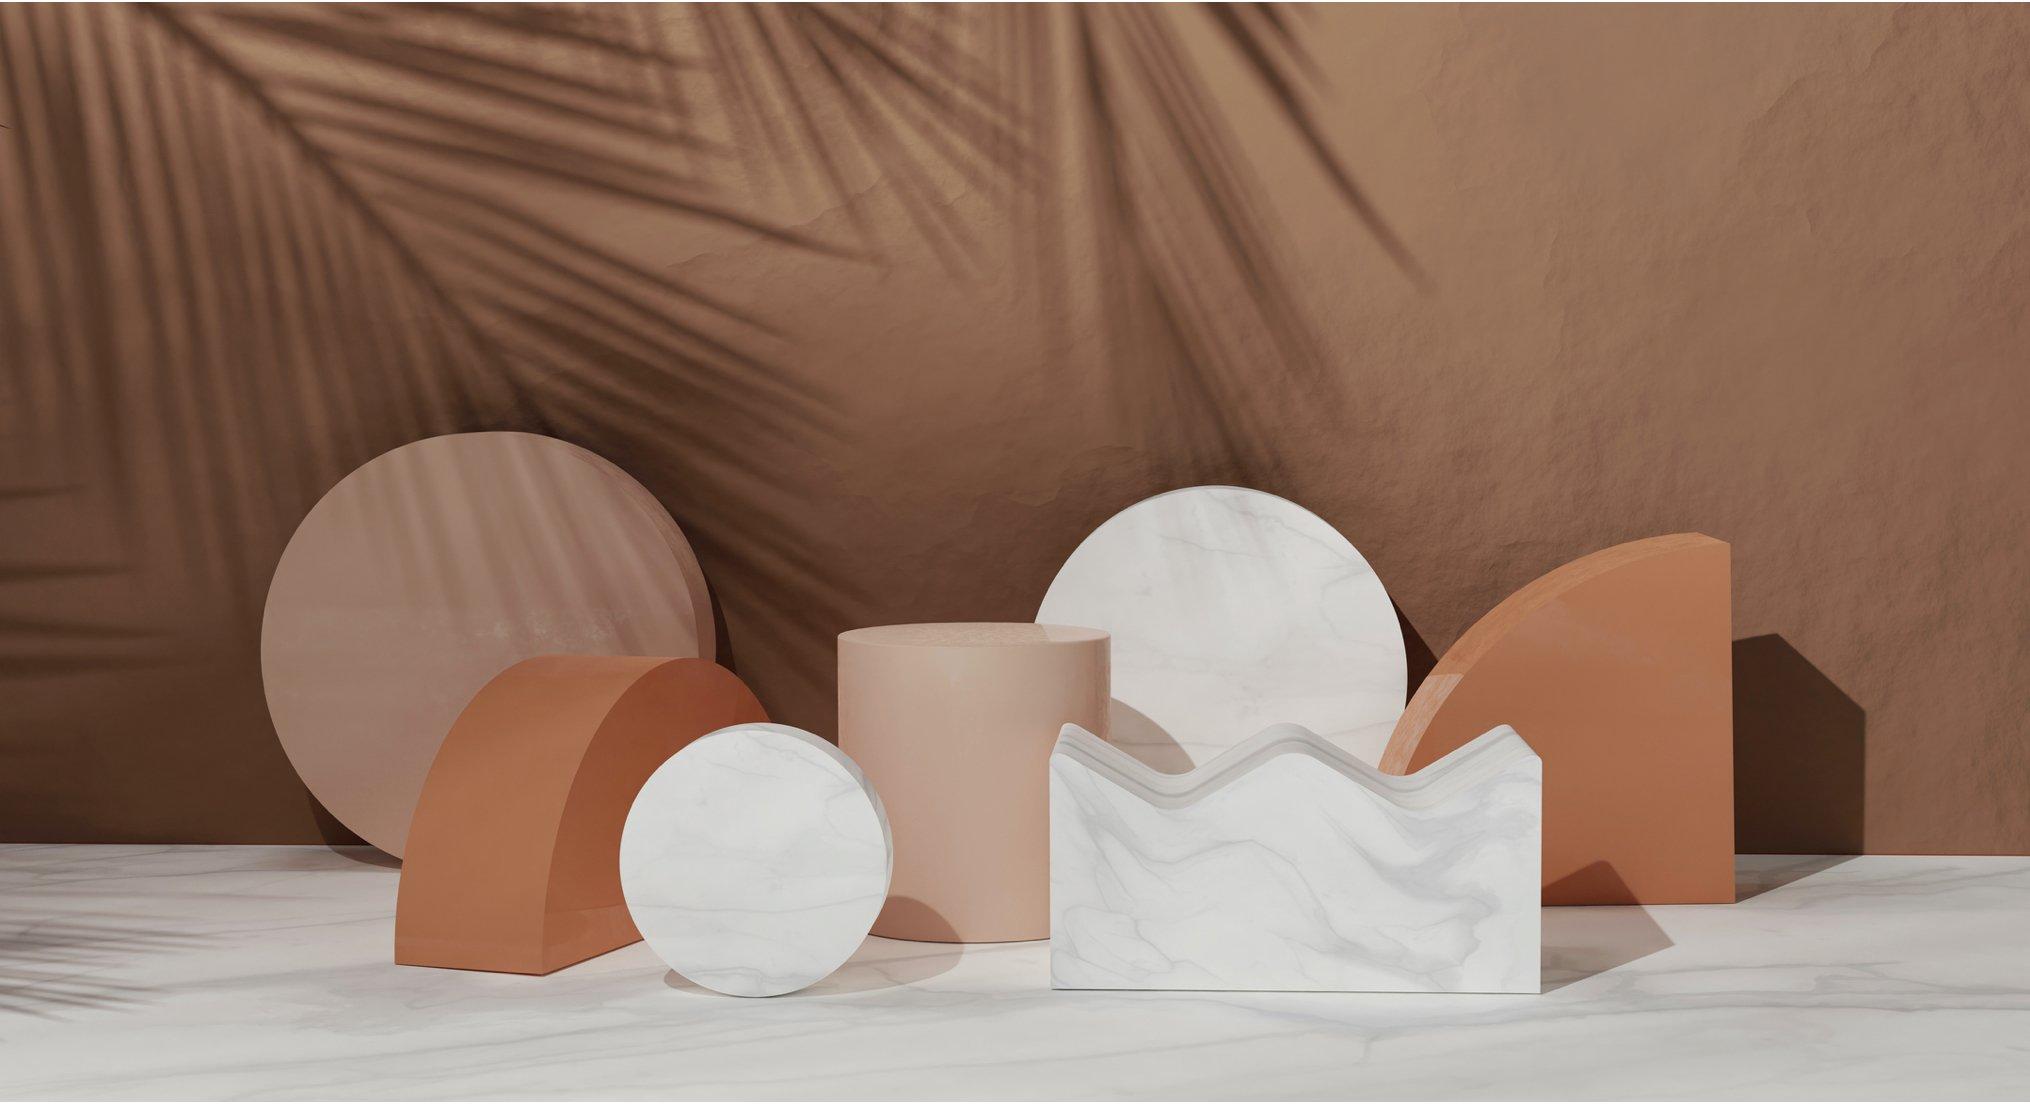 D_Extensis-Design-Forcast-Blog-img-02